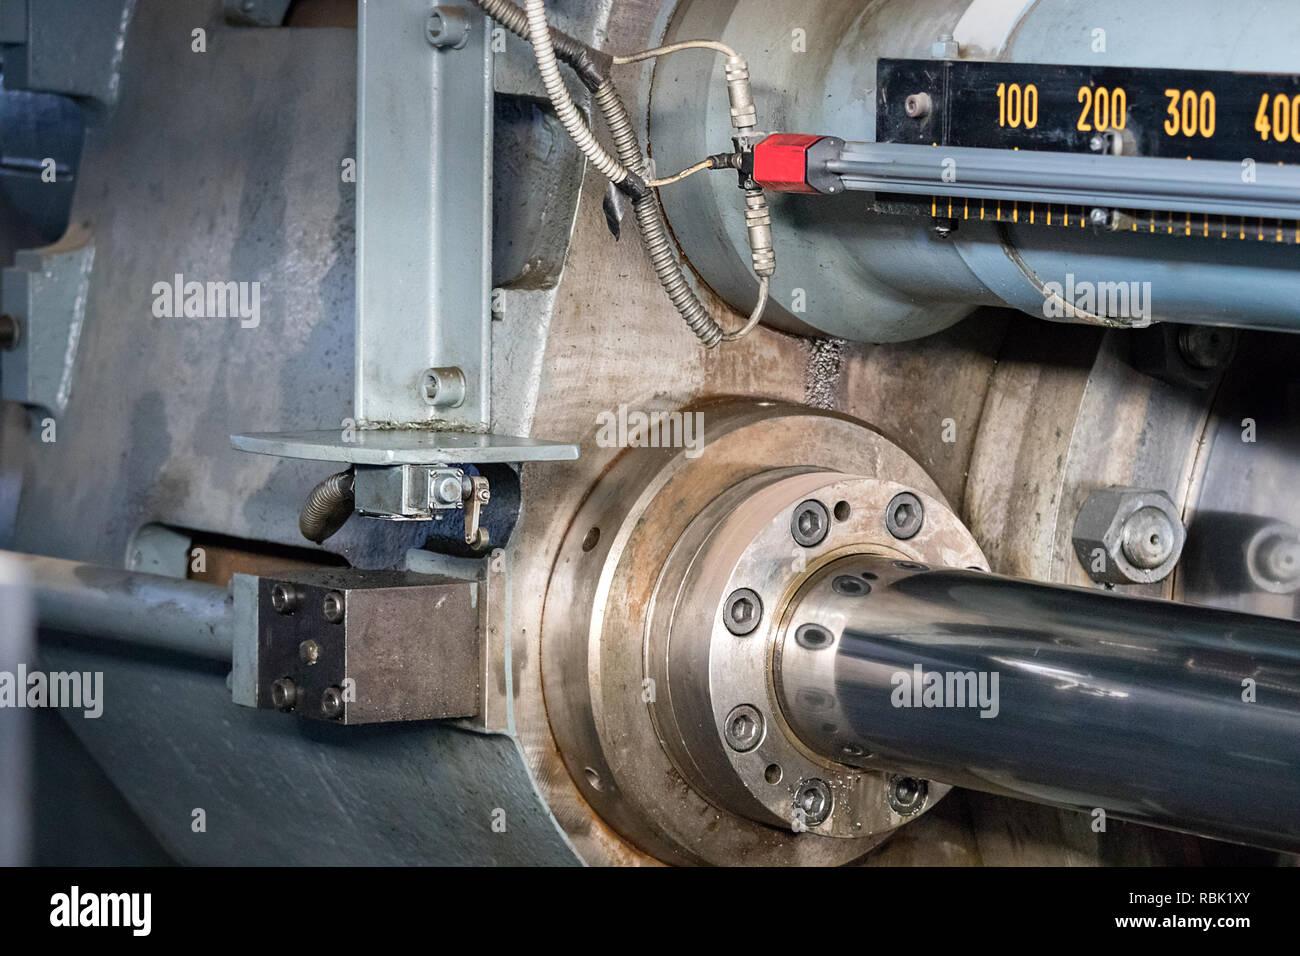 Detail of the short stroke of an aluminium extrusion press. Stock Photo